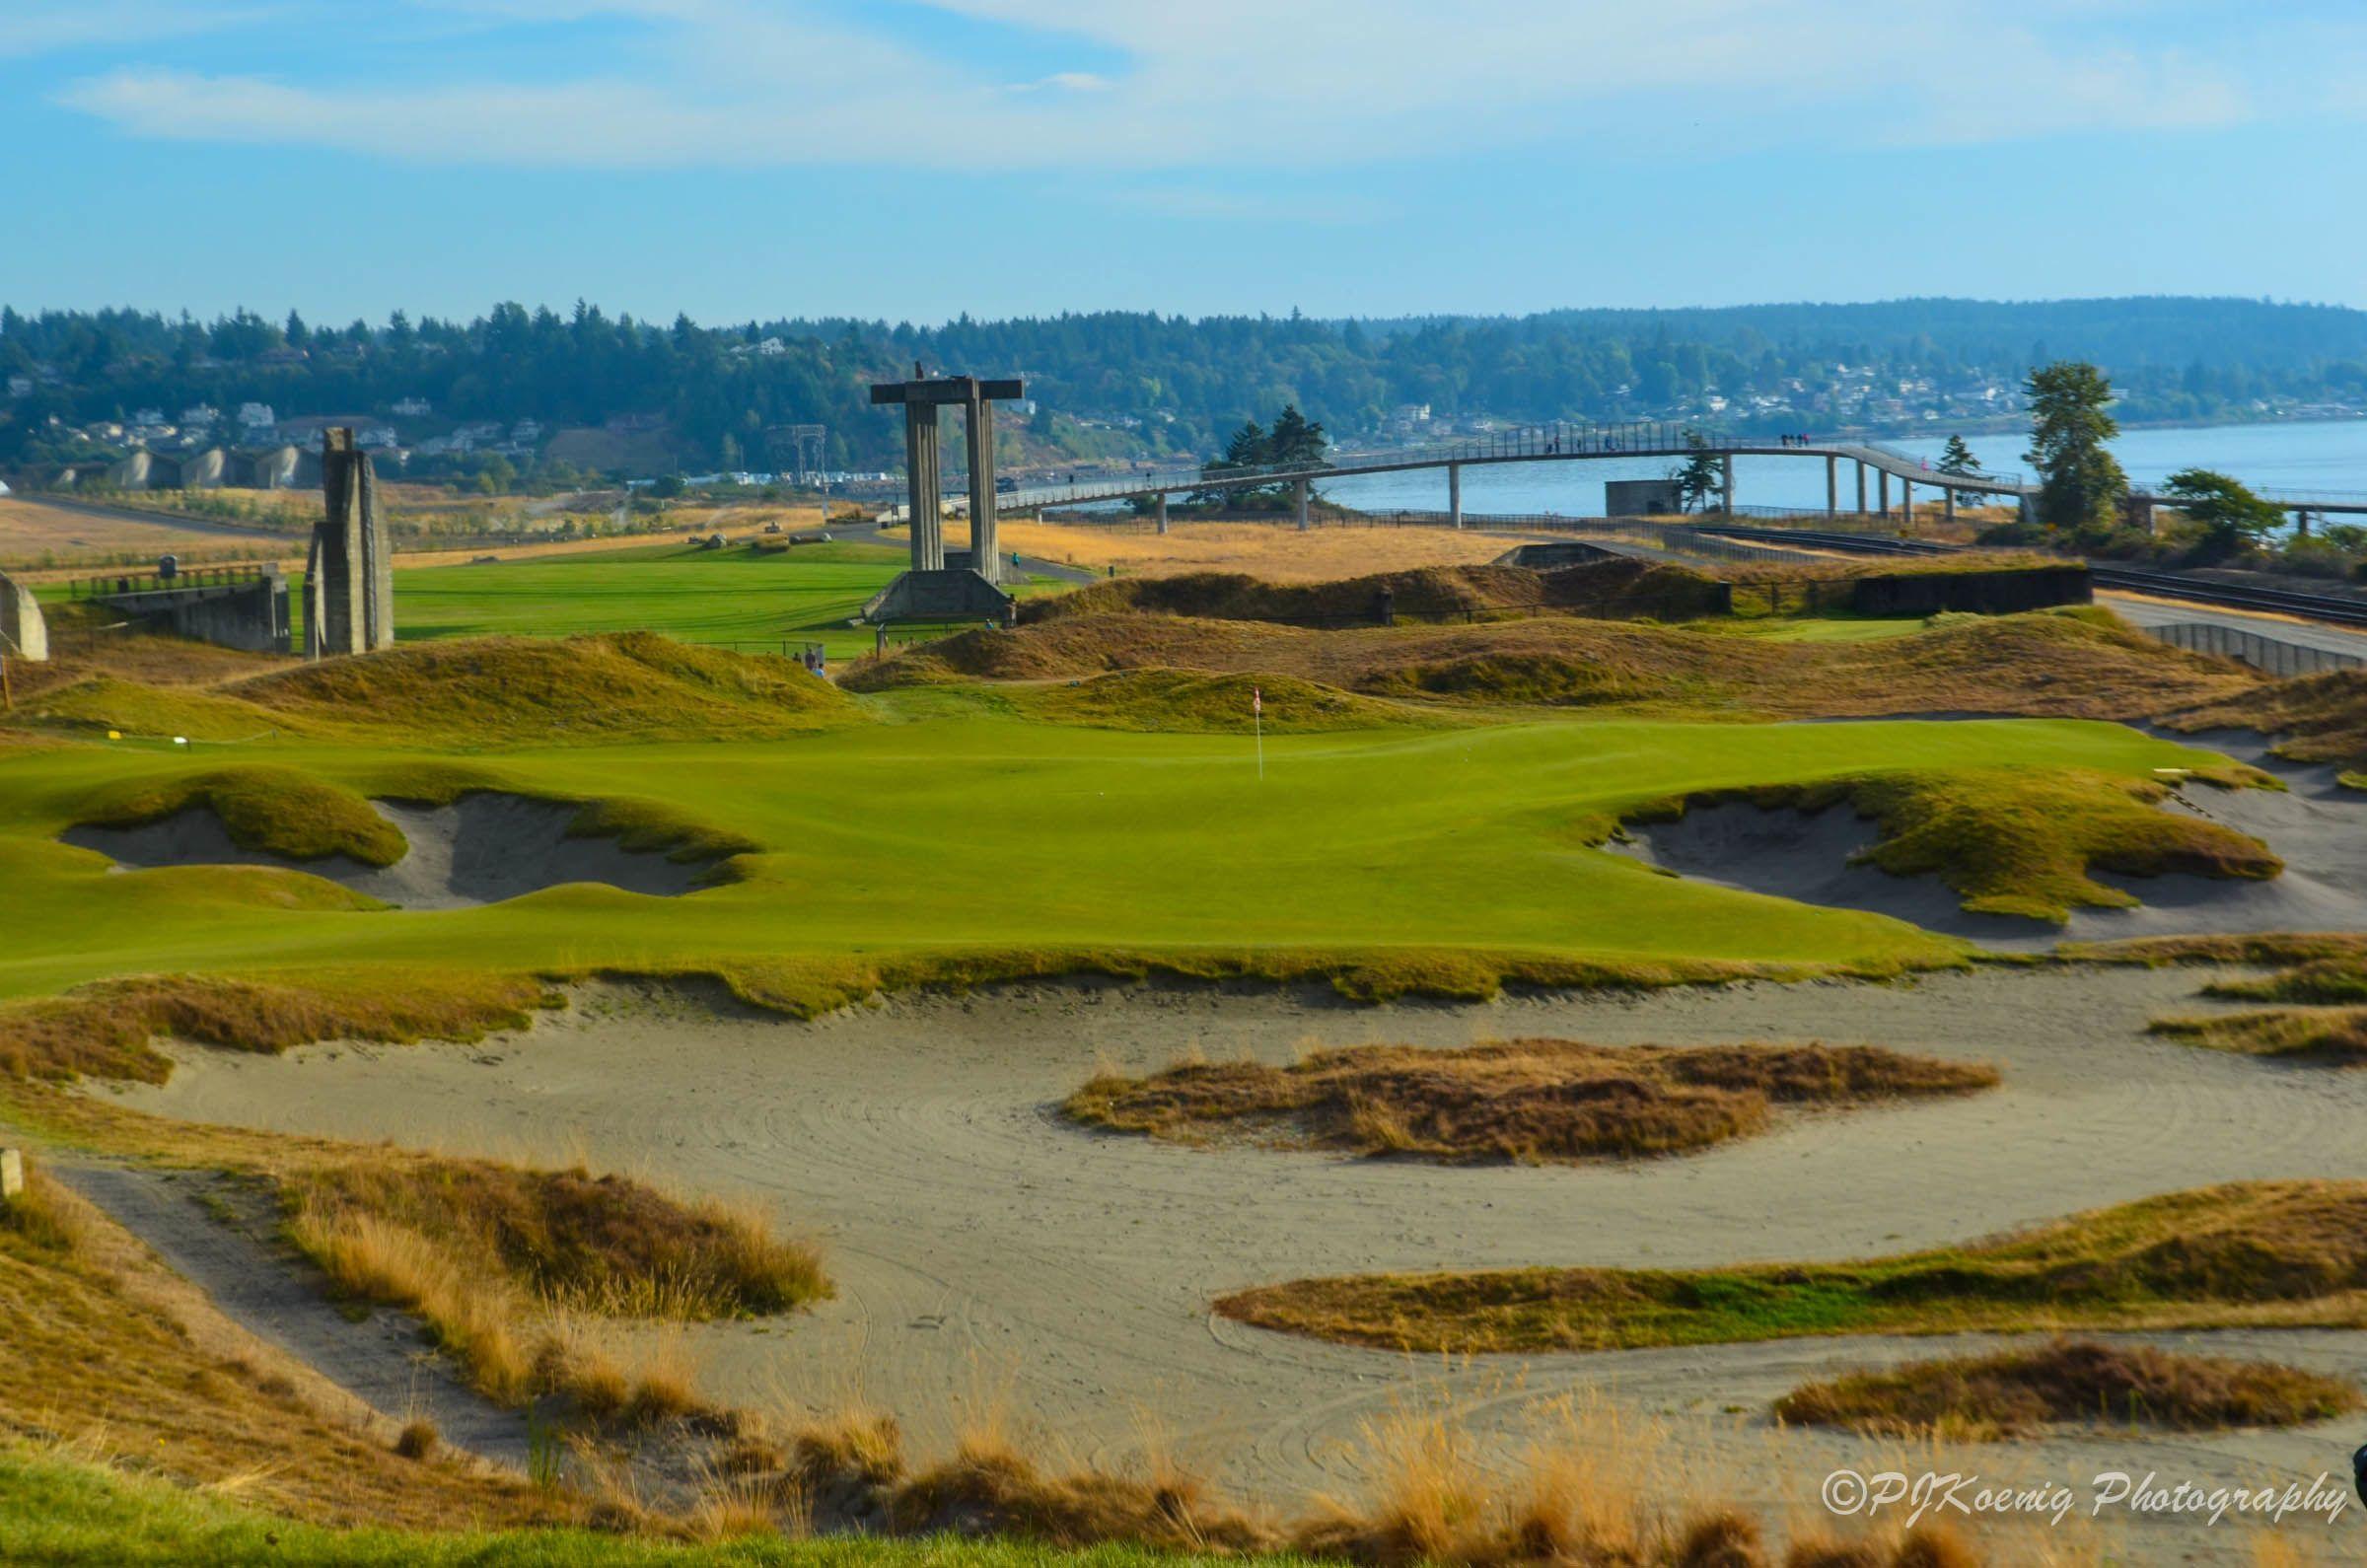 Chamber's Bay Golf Course - Tacoma, WA